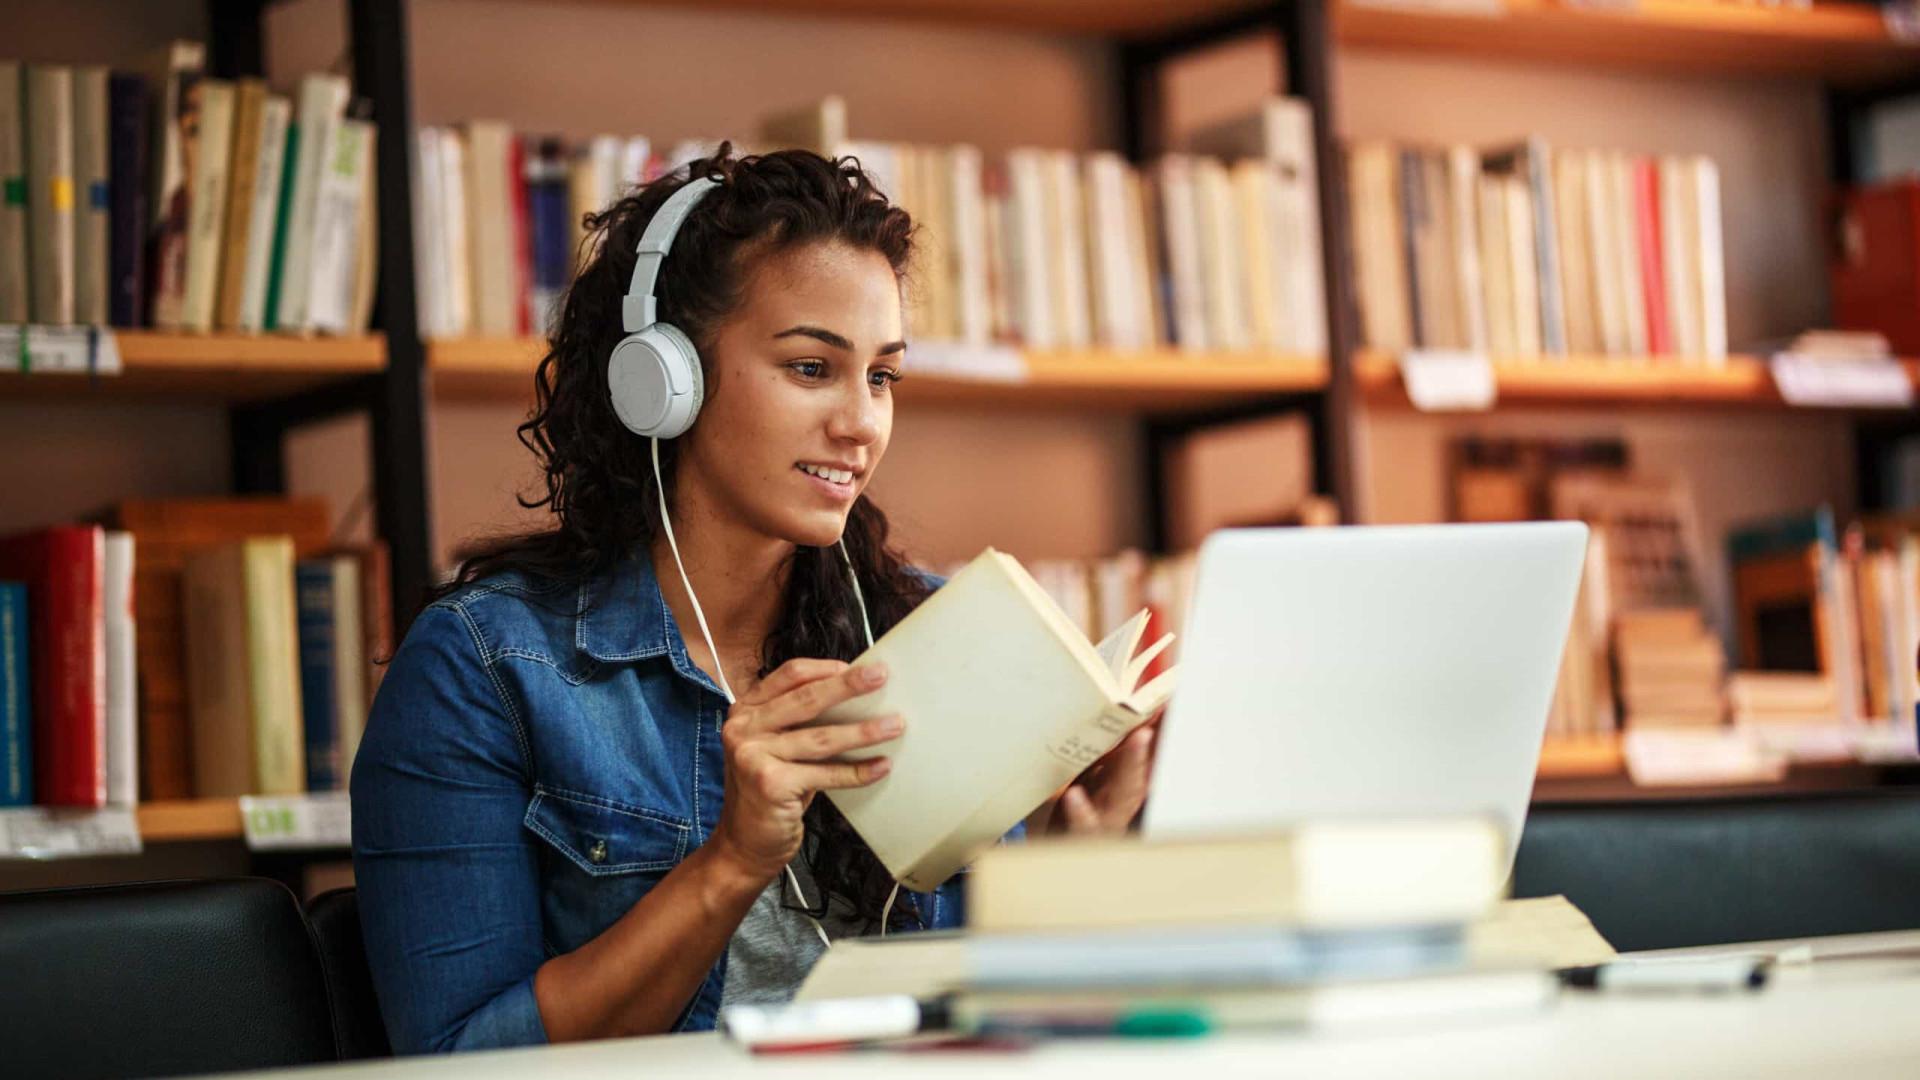 SP Leituras traz atividades online durante a pandemia